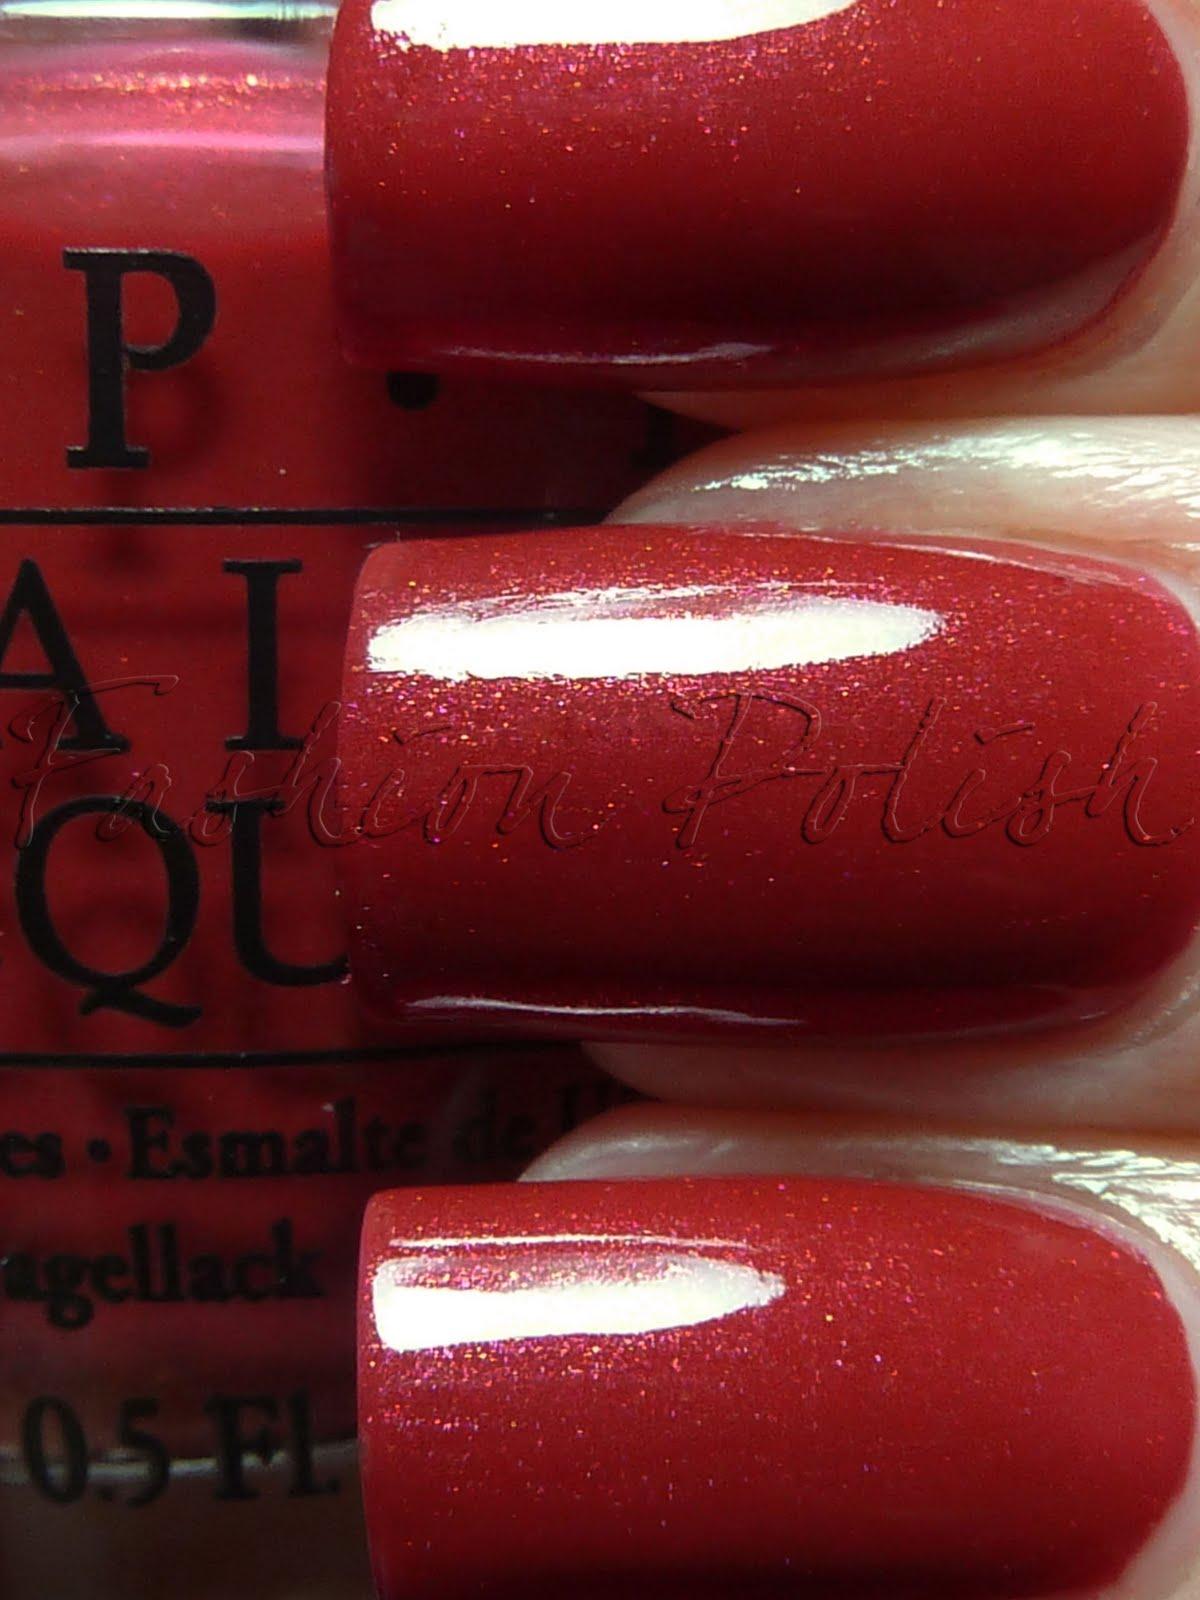 Opi Color To Diner For Misch's Beauty Blog: N...